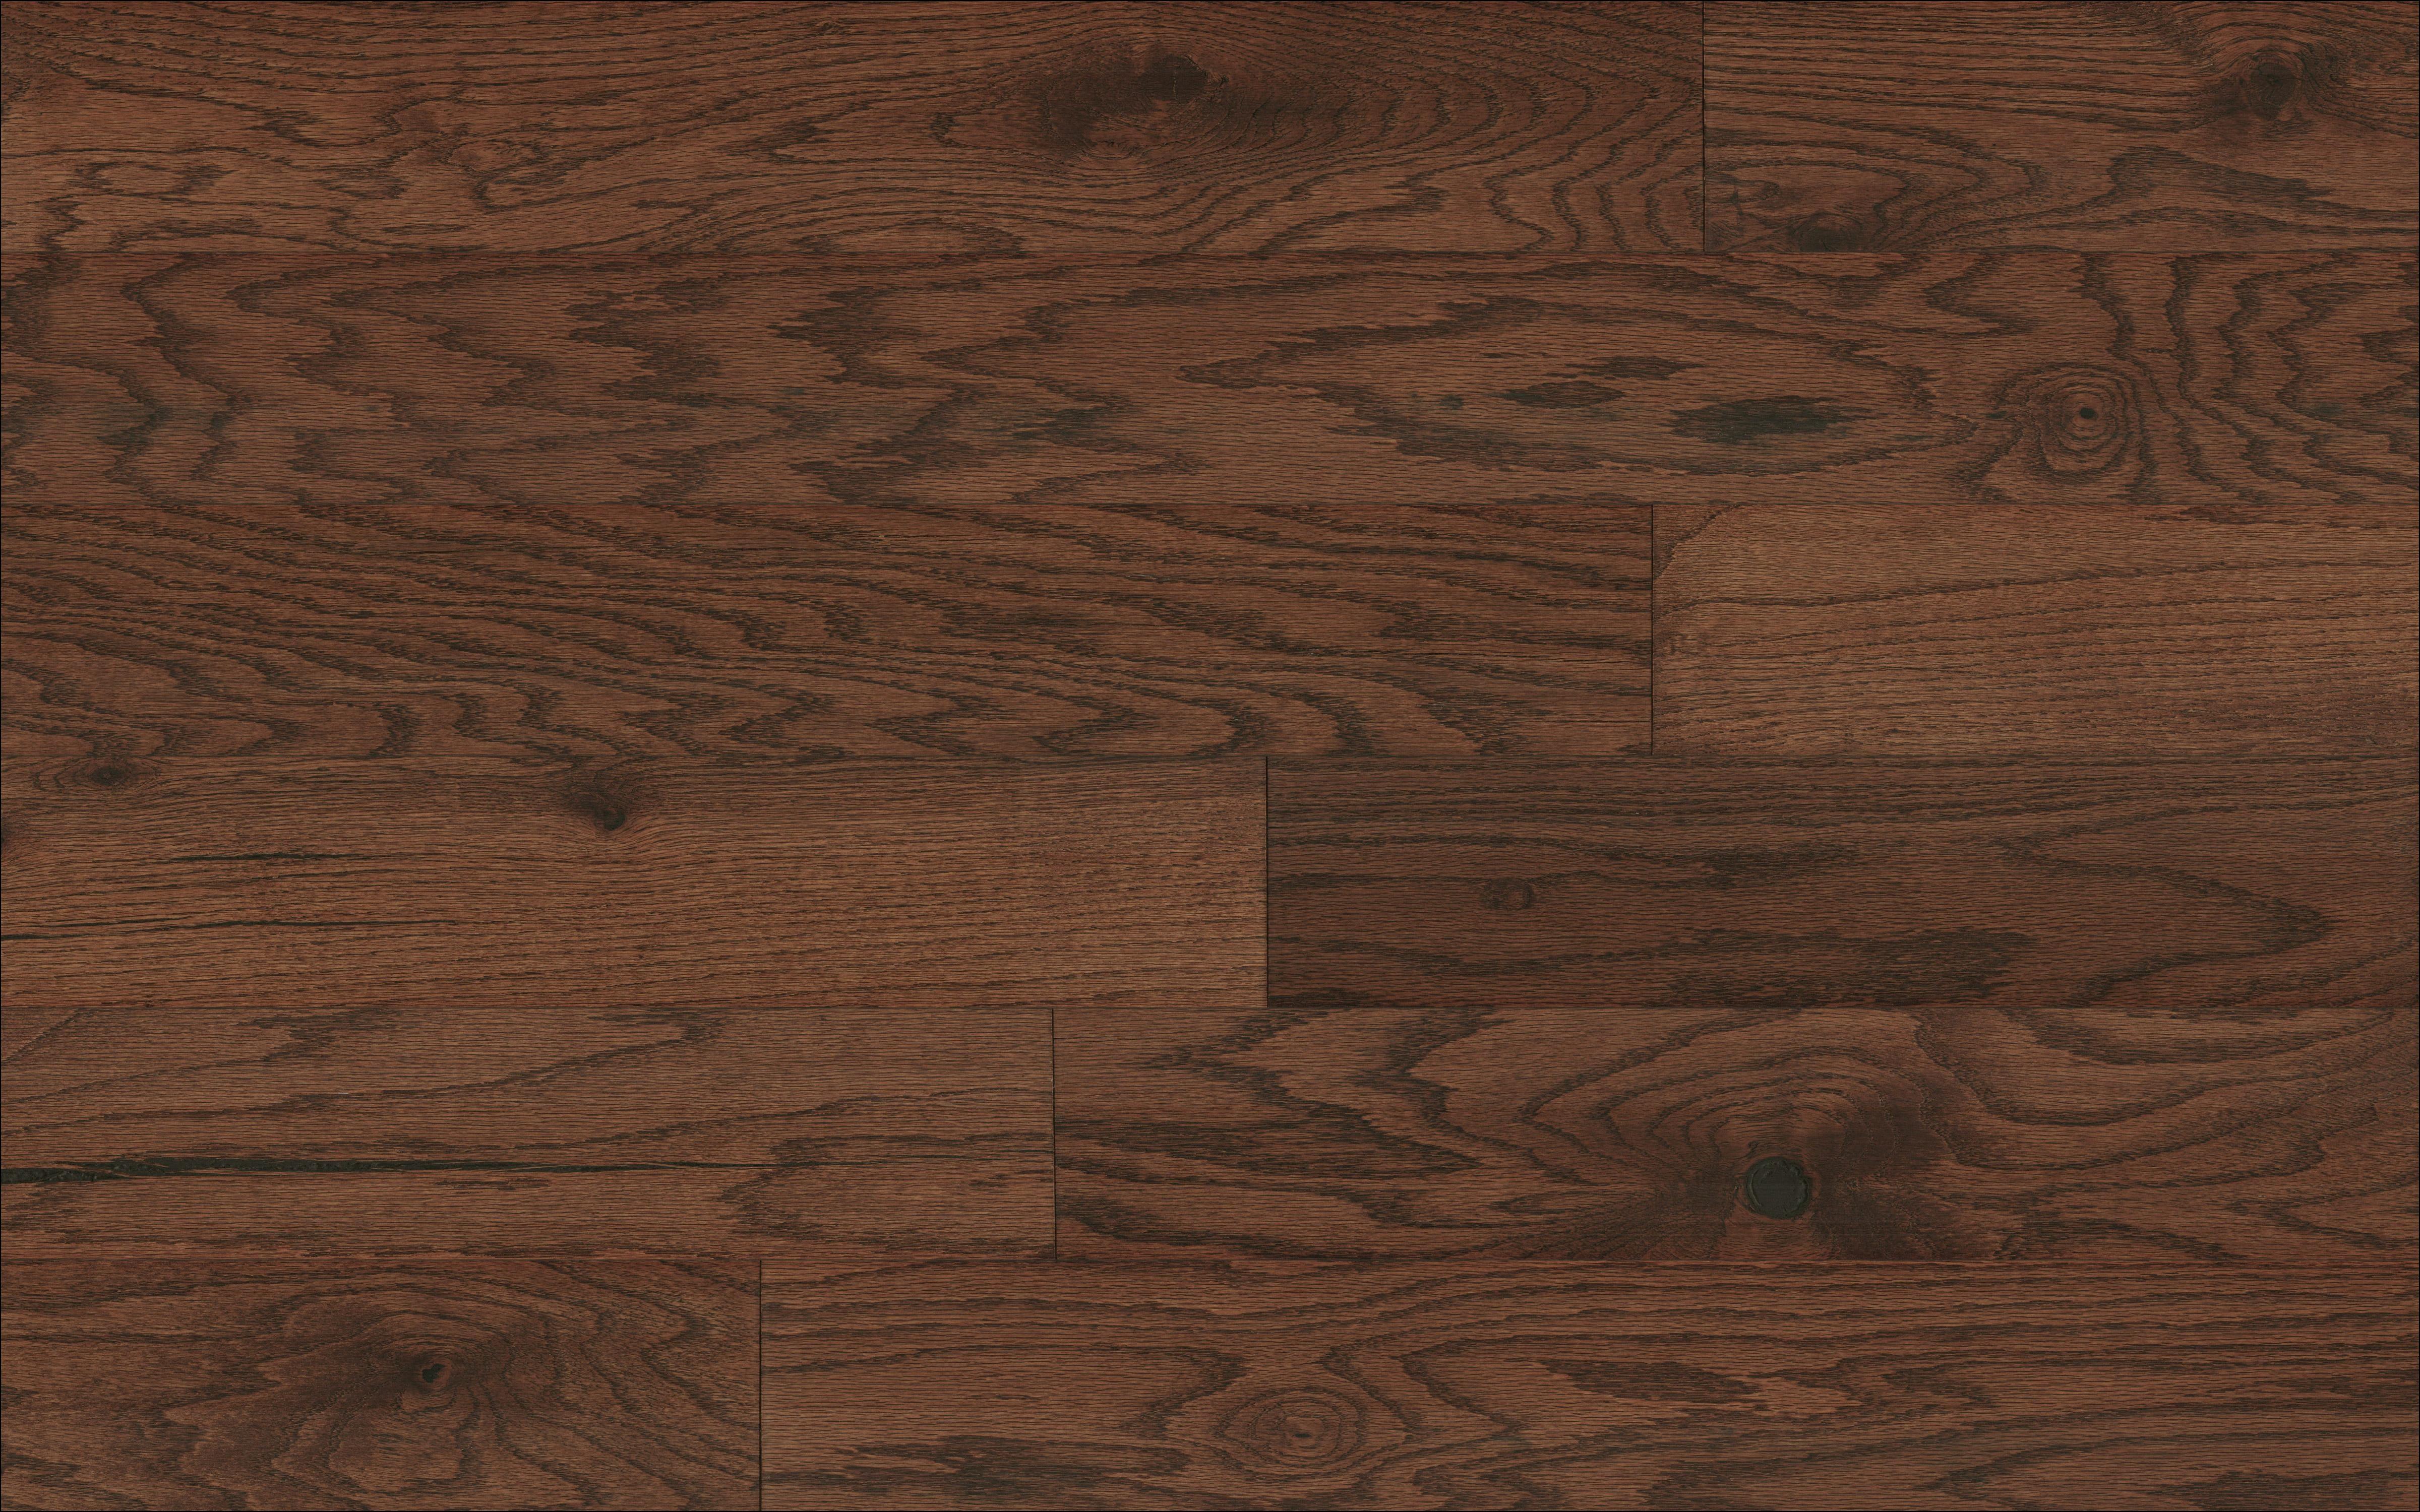 average cost of prefinished hardwood flooring installation of best place flooring ideas inside best place to buy engineered hardwood flooring collection mullican devonshire oak saddle 5 engineered hardwood